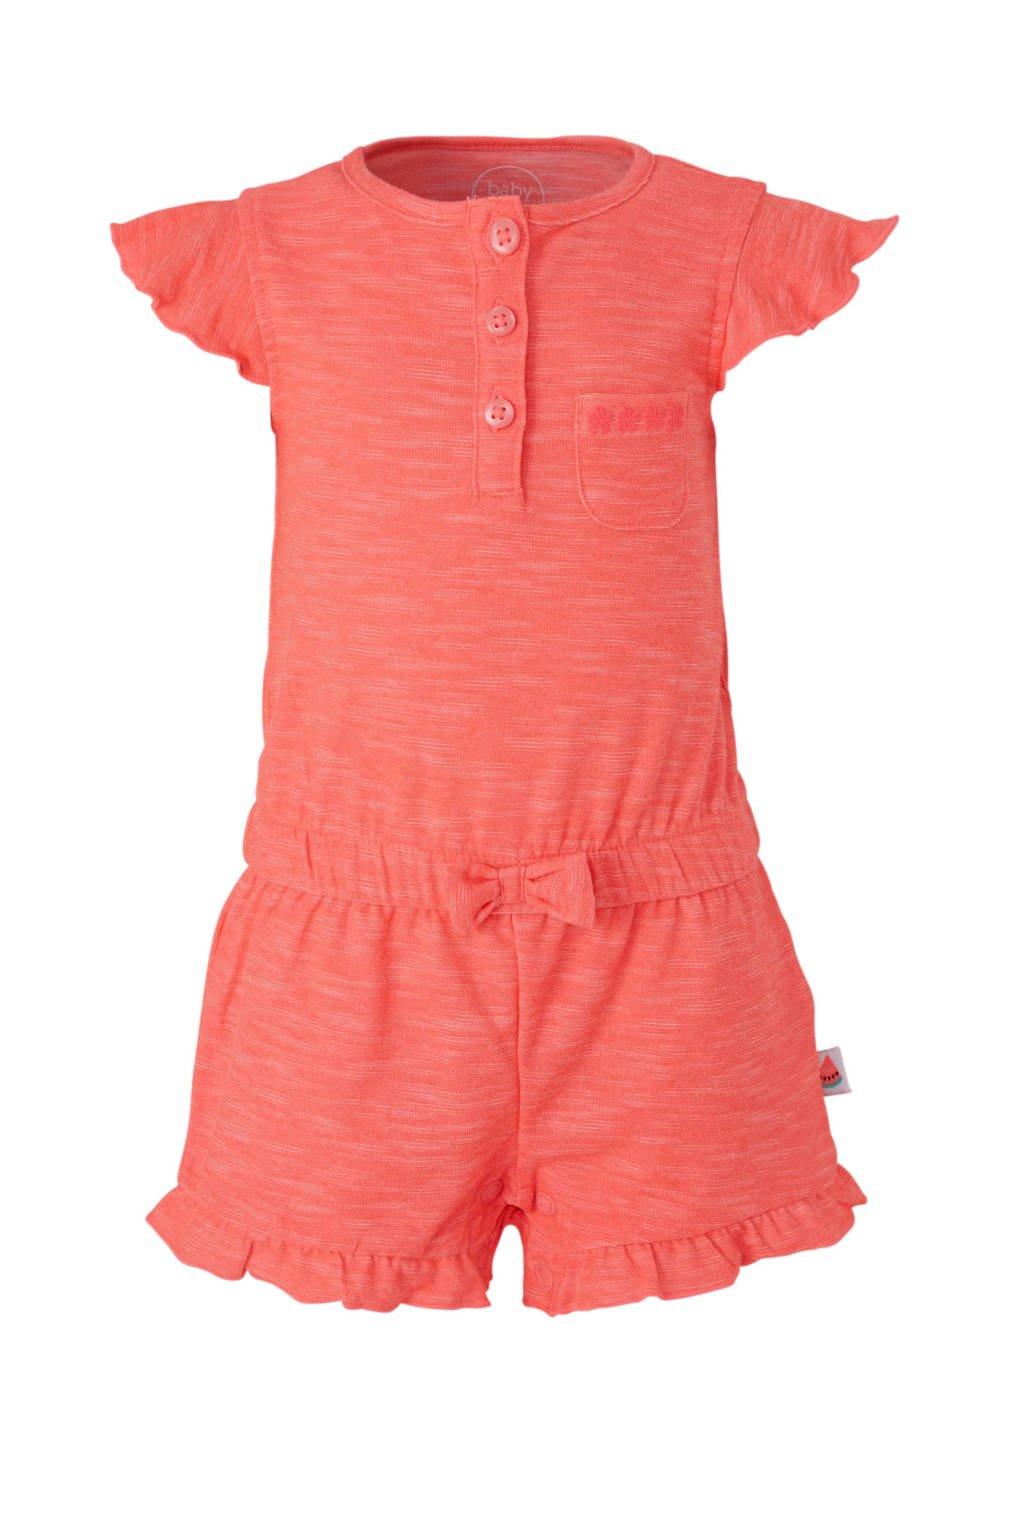 C&A Baby Club jumpsuit felroze, Felroze